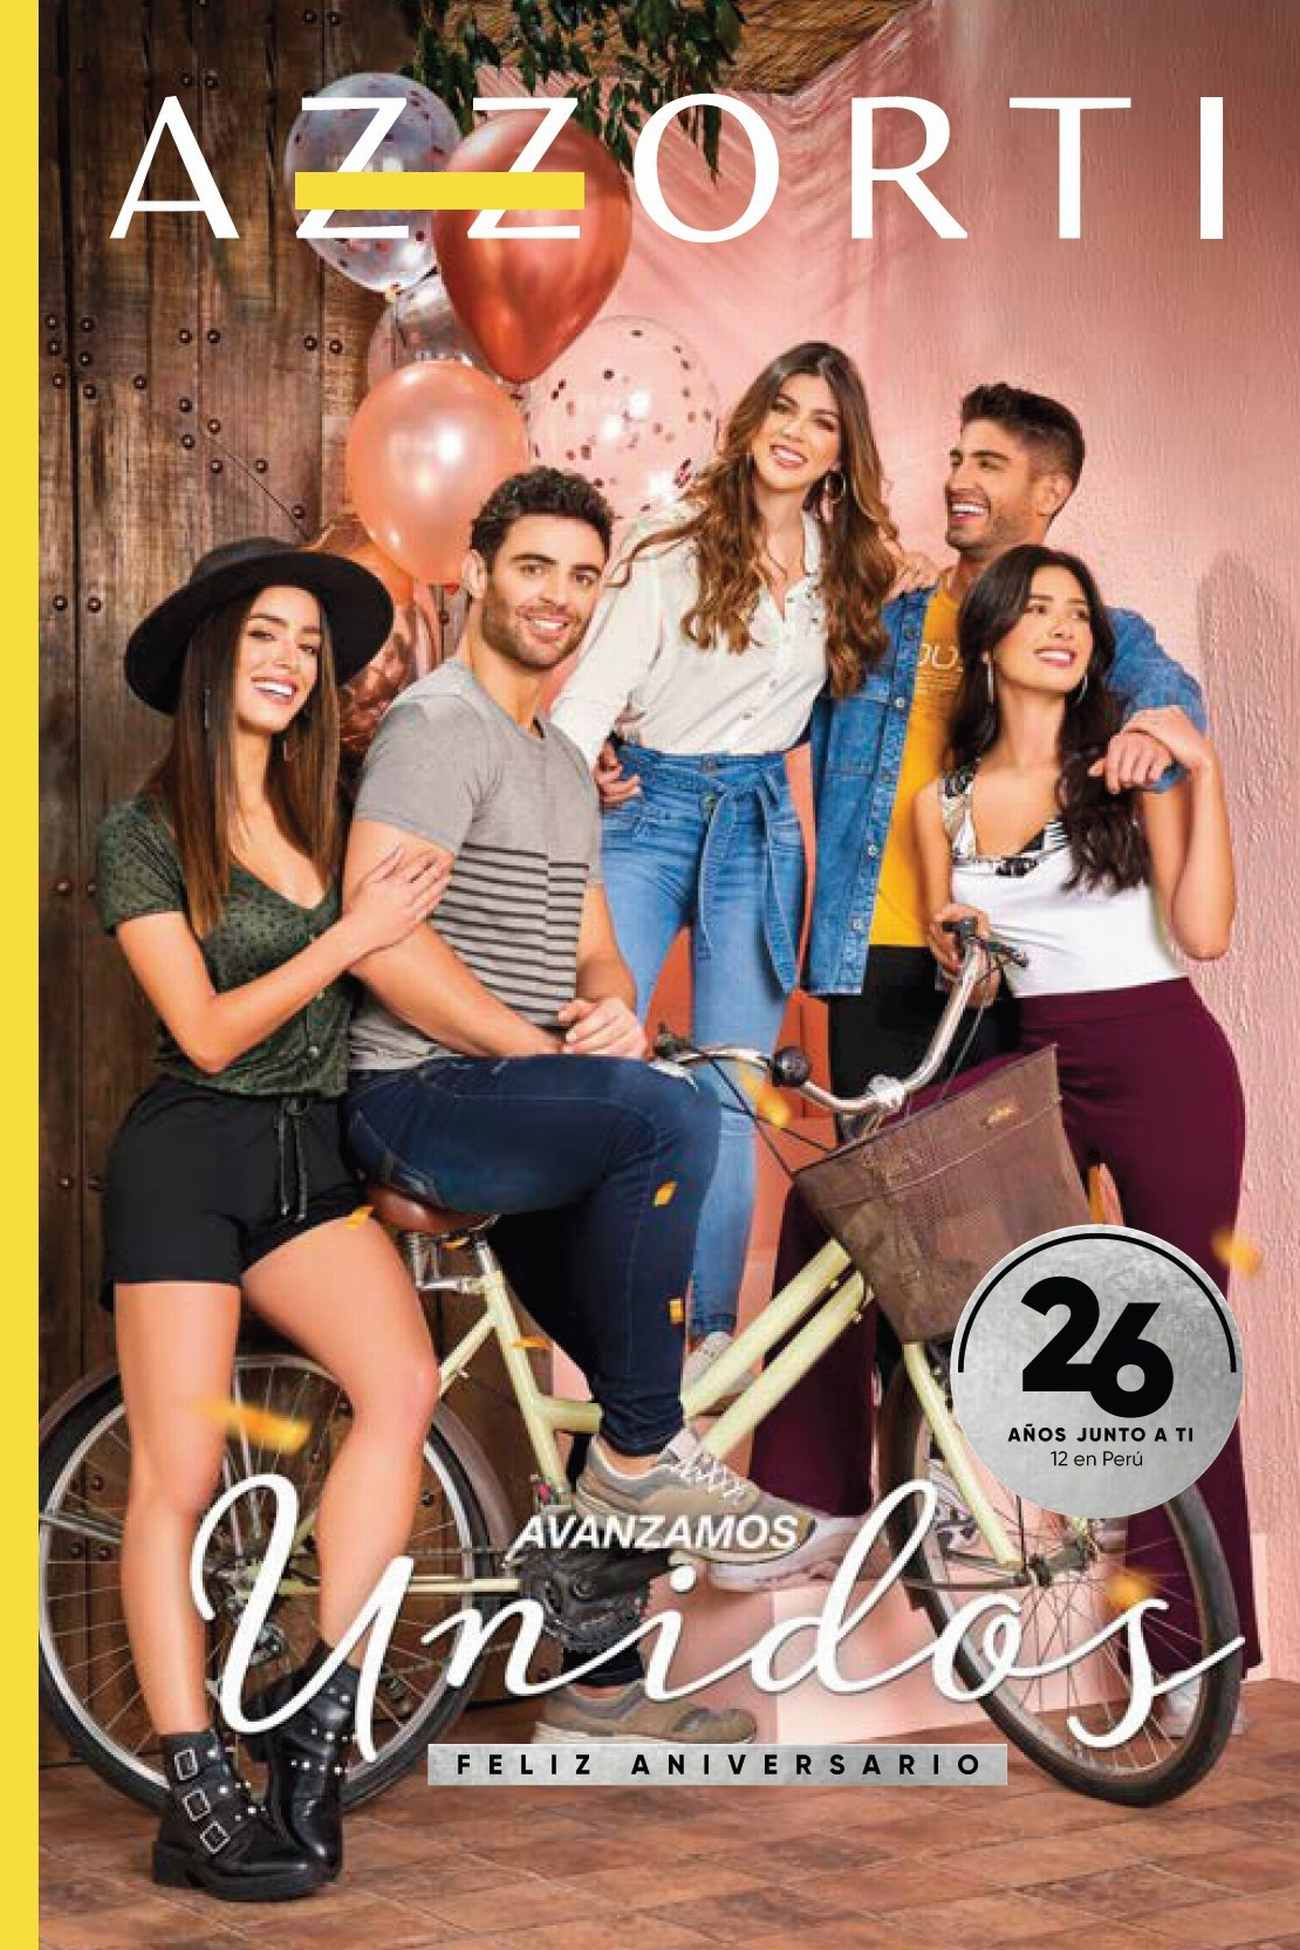 Catálogo Dupree Azzorti Campaña 15 2021 Perú